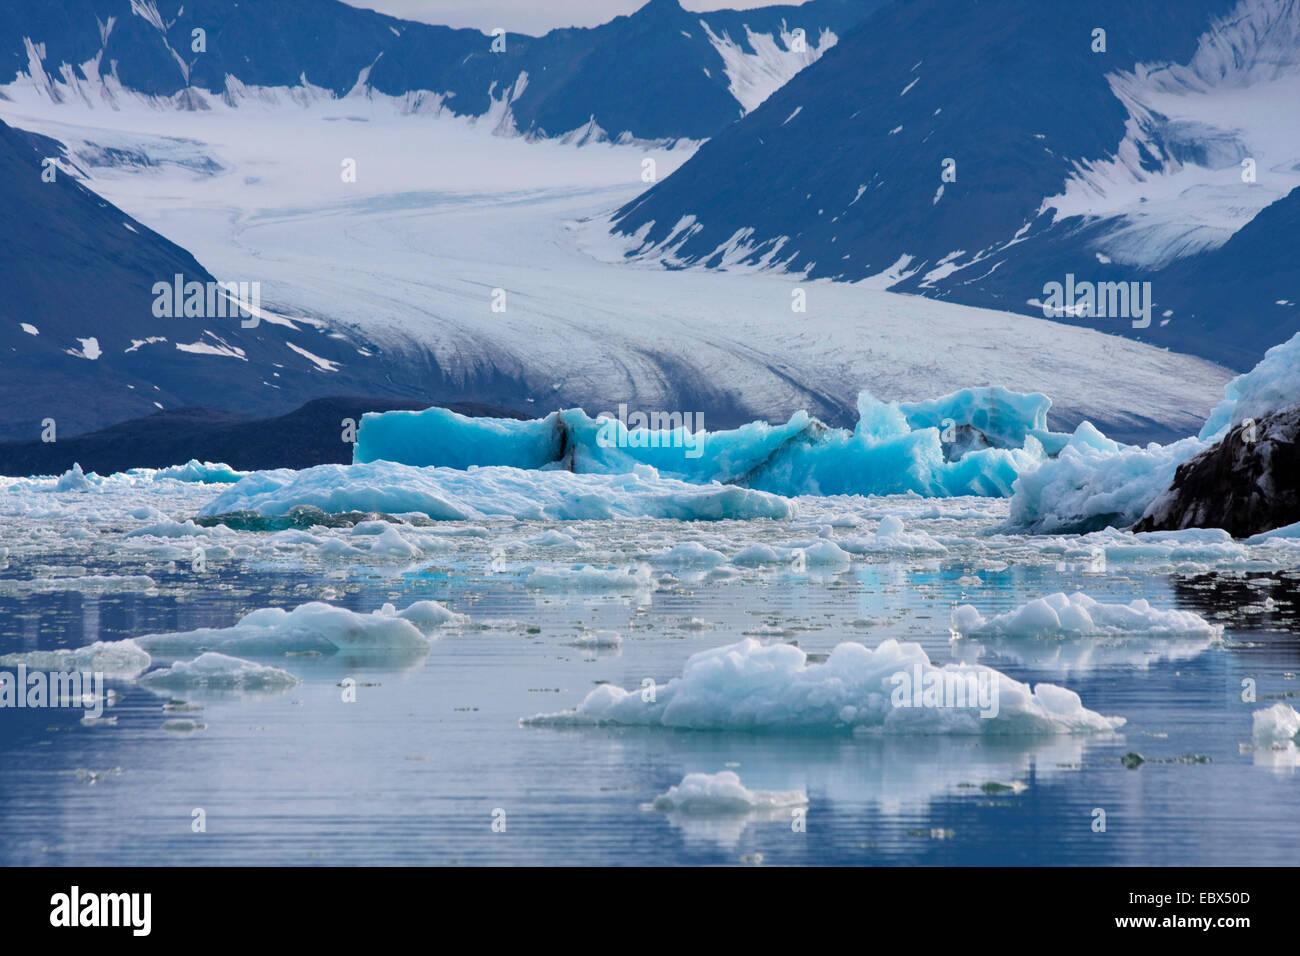 Glacier de Feiringfjellet avec azur iceberg en premier plan, la Norvège, Svalbard, Kongsfjorden Photo Stock